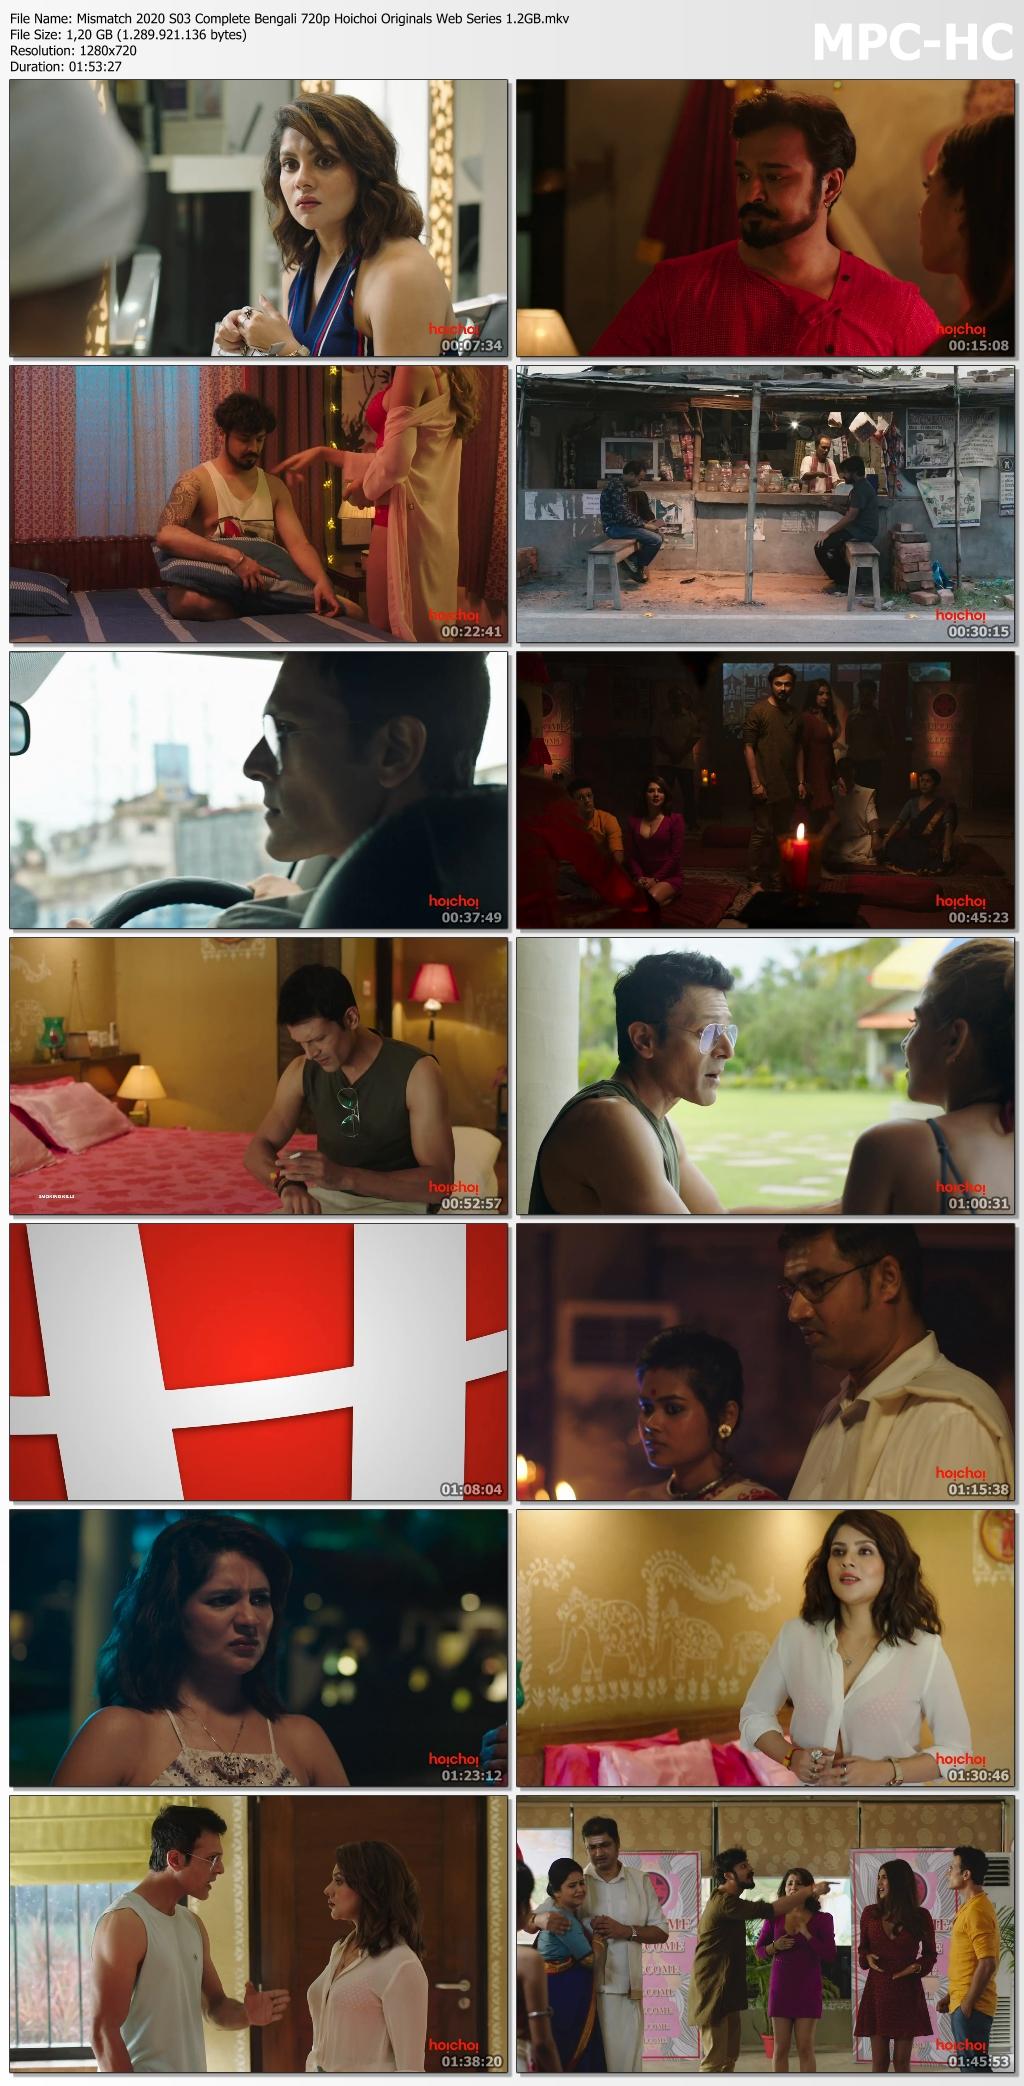 Mismatch-2020-S03-Complete-Bengali-720p-Hoichoi-Originals-Web-Series-1-2-GB-mkv-thumbs